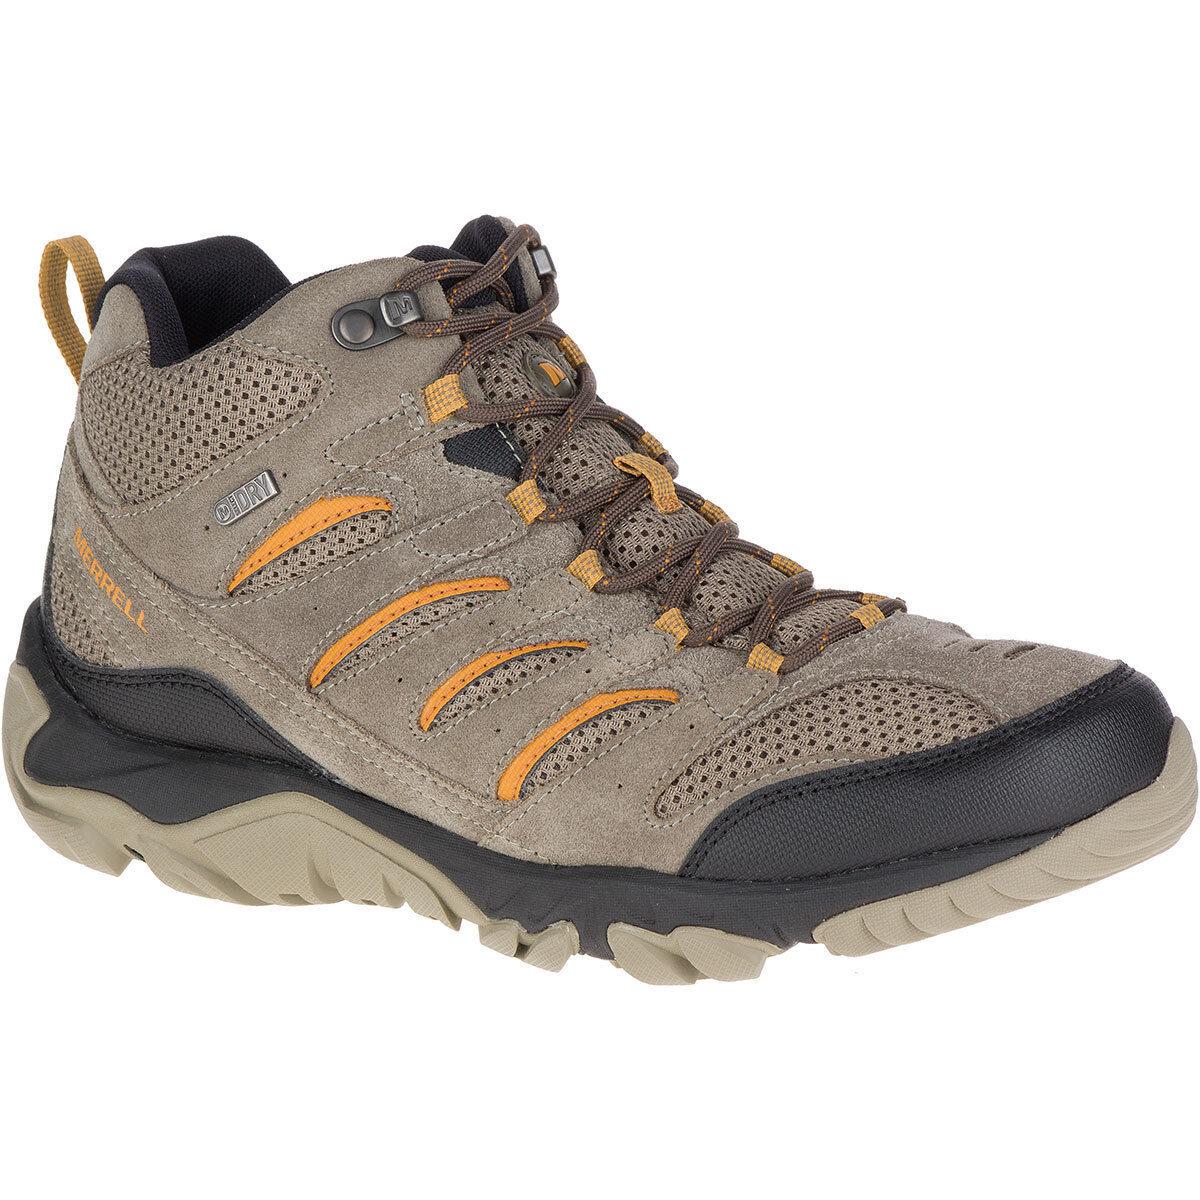 Merrell Men's Ventilator White Pine Mid Waterproof Walking Hiking Boots shoes